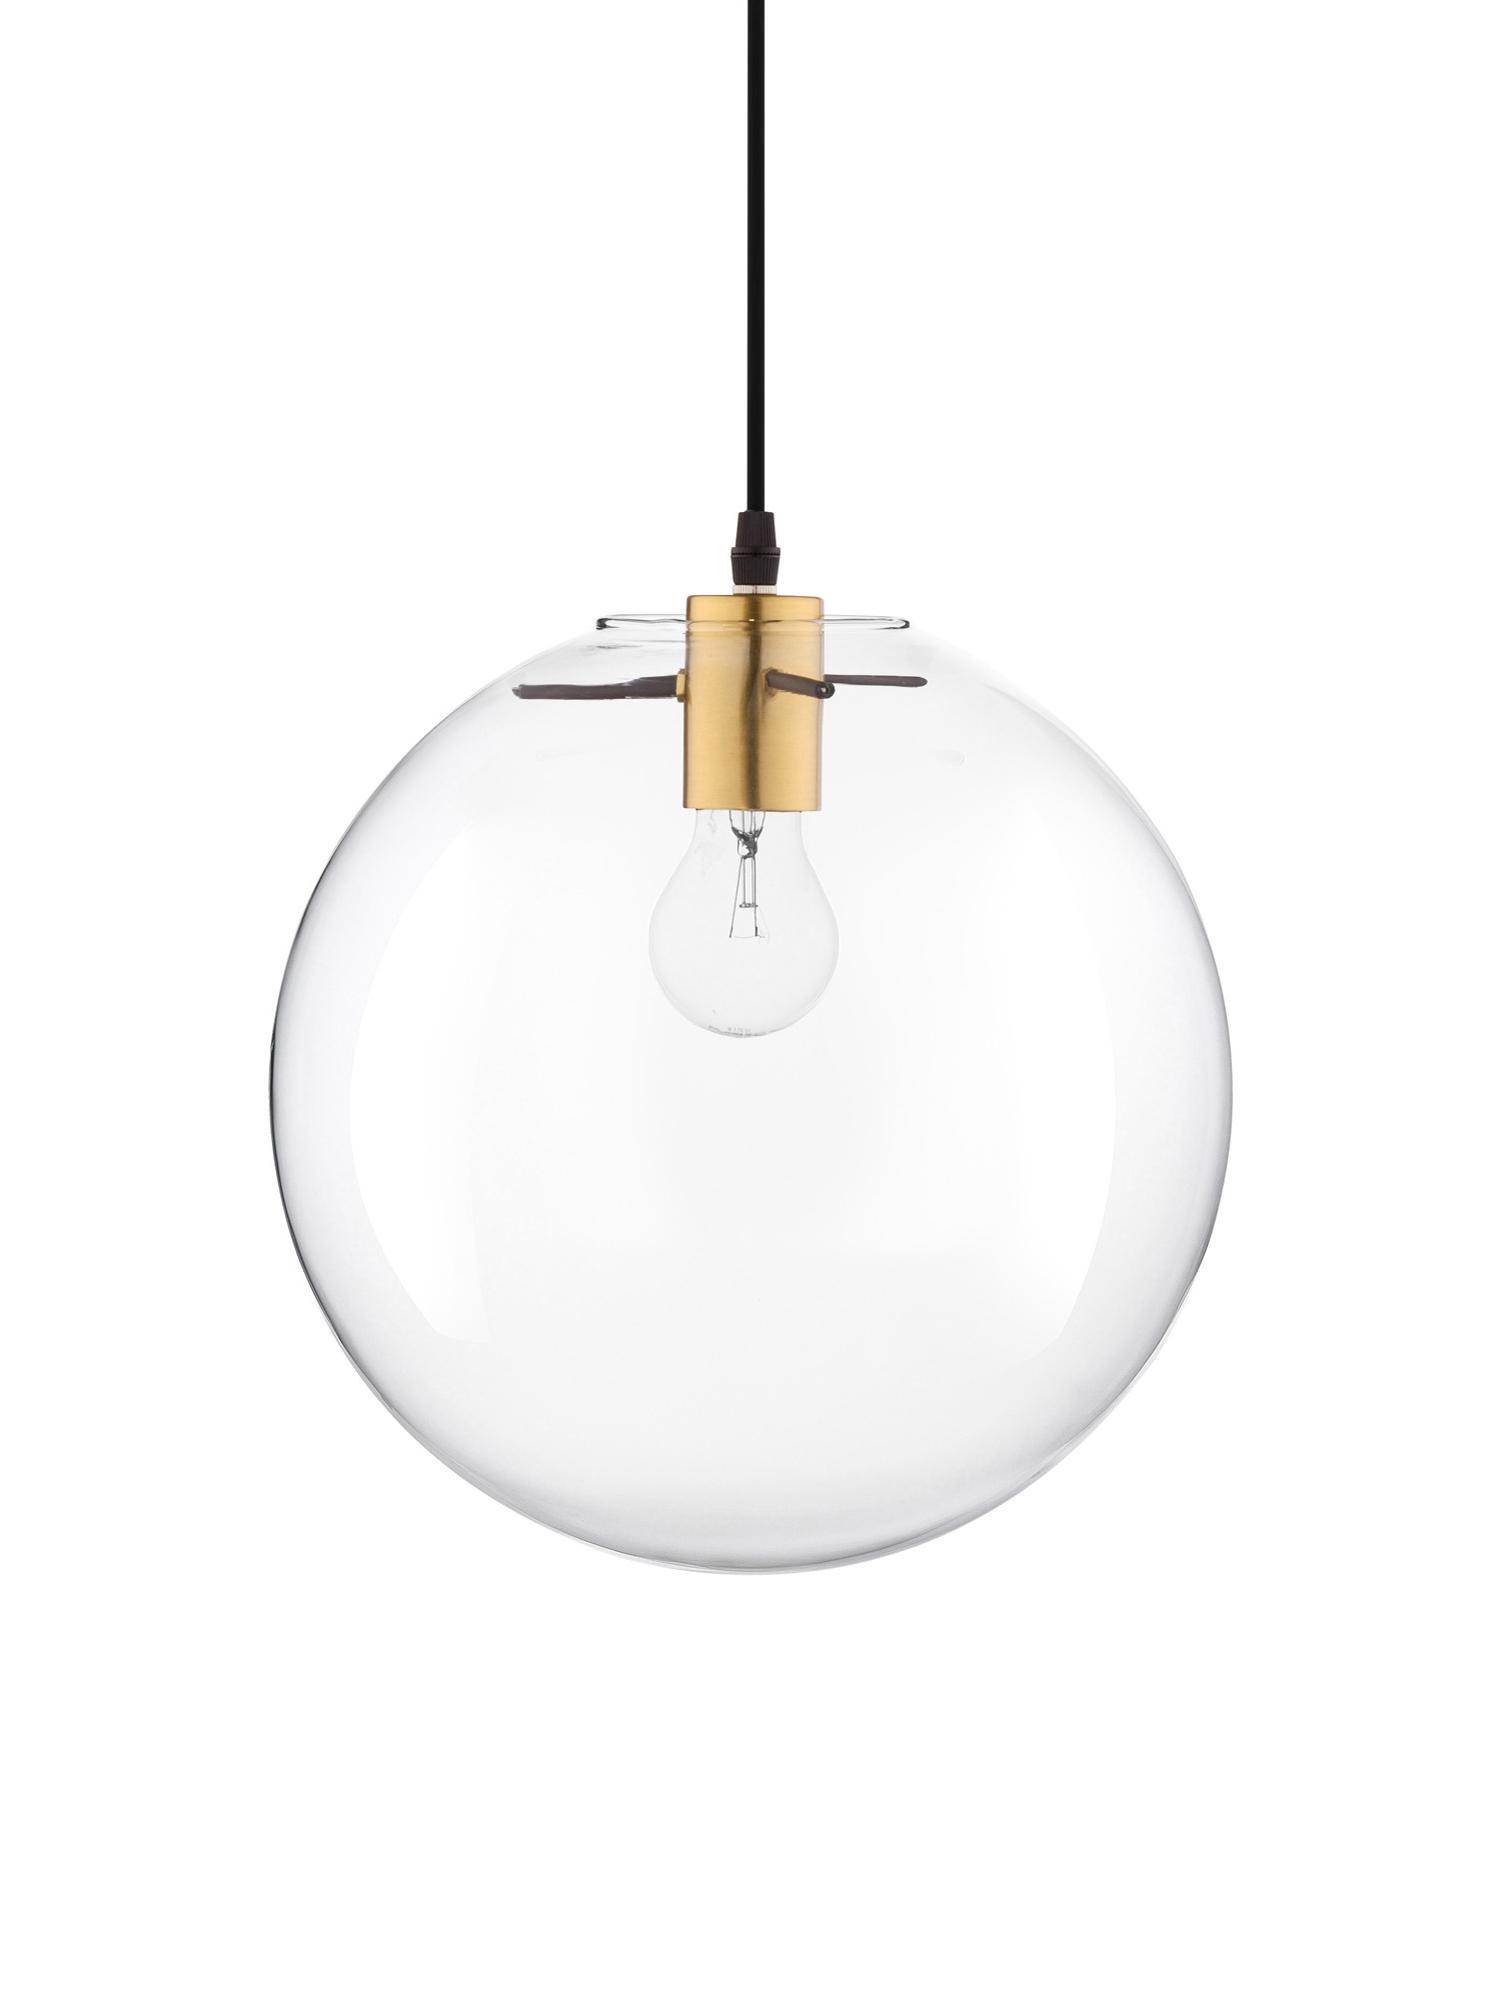 Hanglamp Mirale met glazen lampenkap, Lampenkap: glas, Baldakijn: kunststof, Messingkleurig, transparant, Ø 25 x H 26 cm